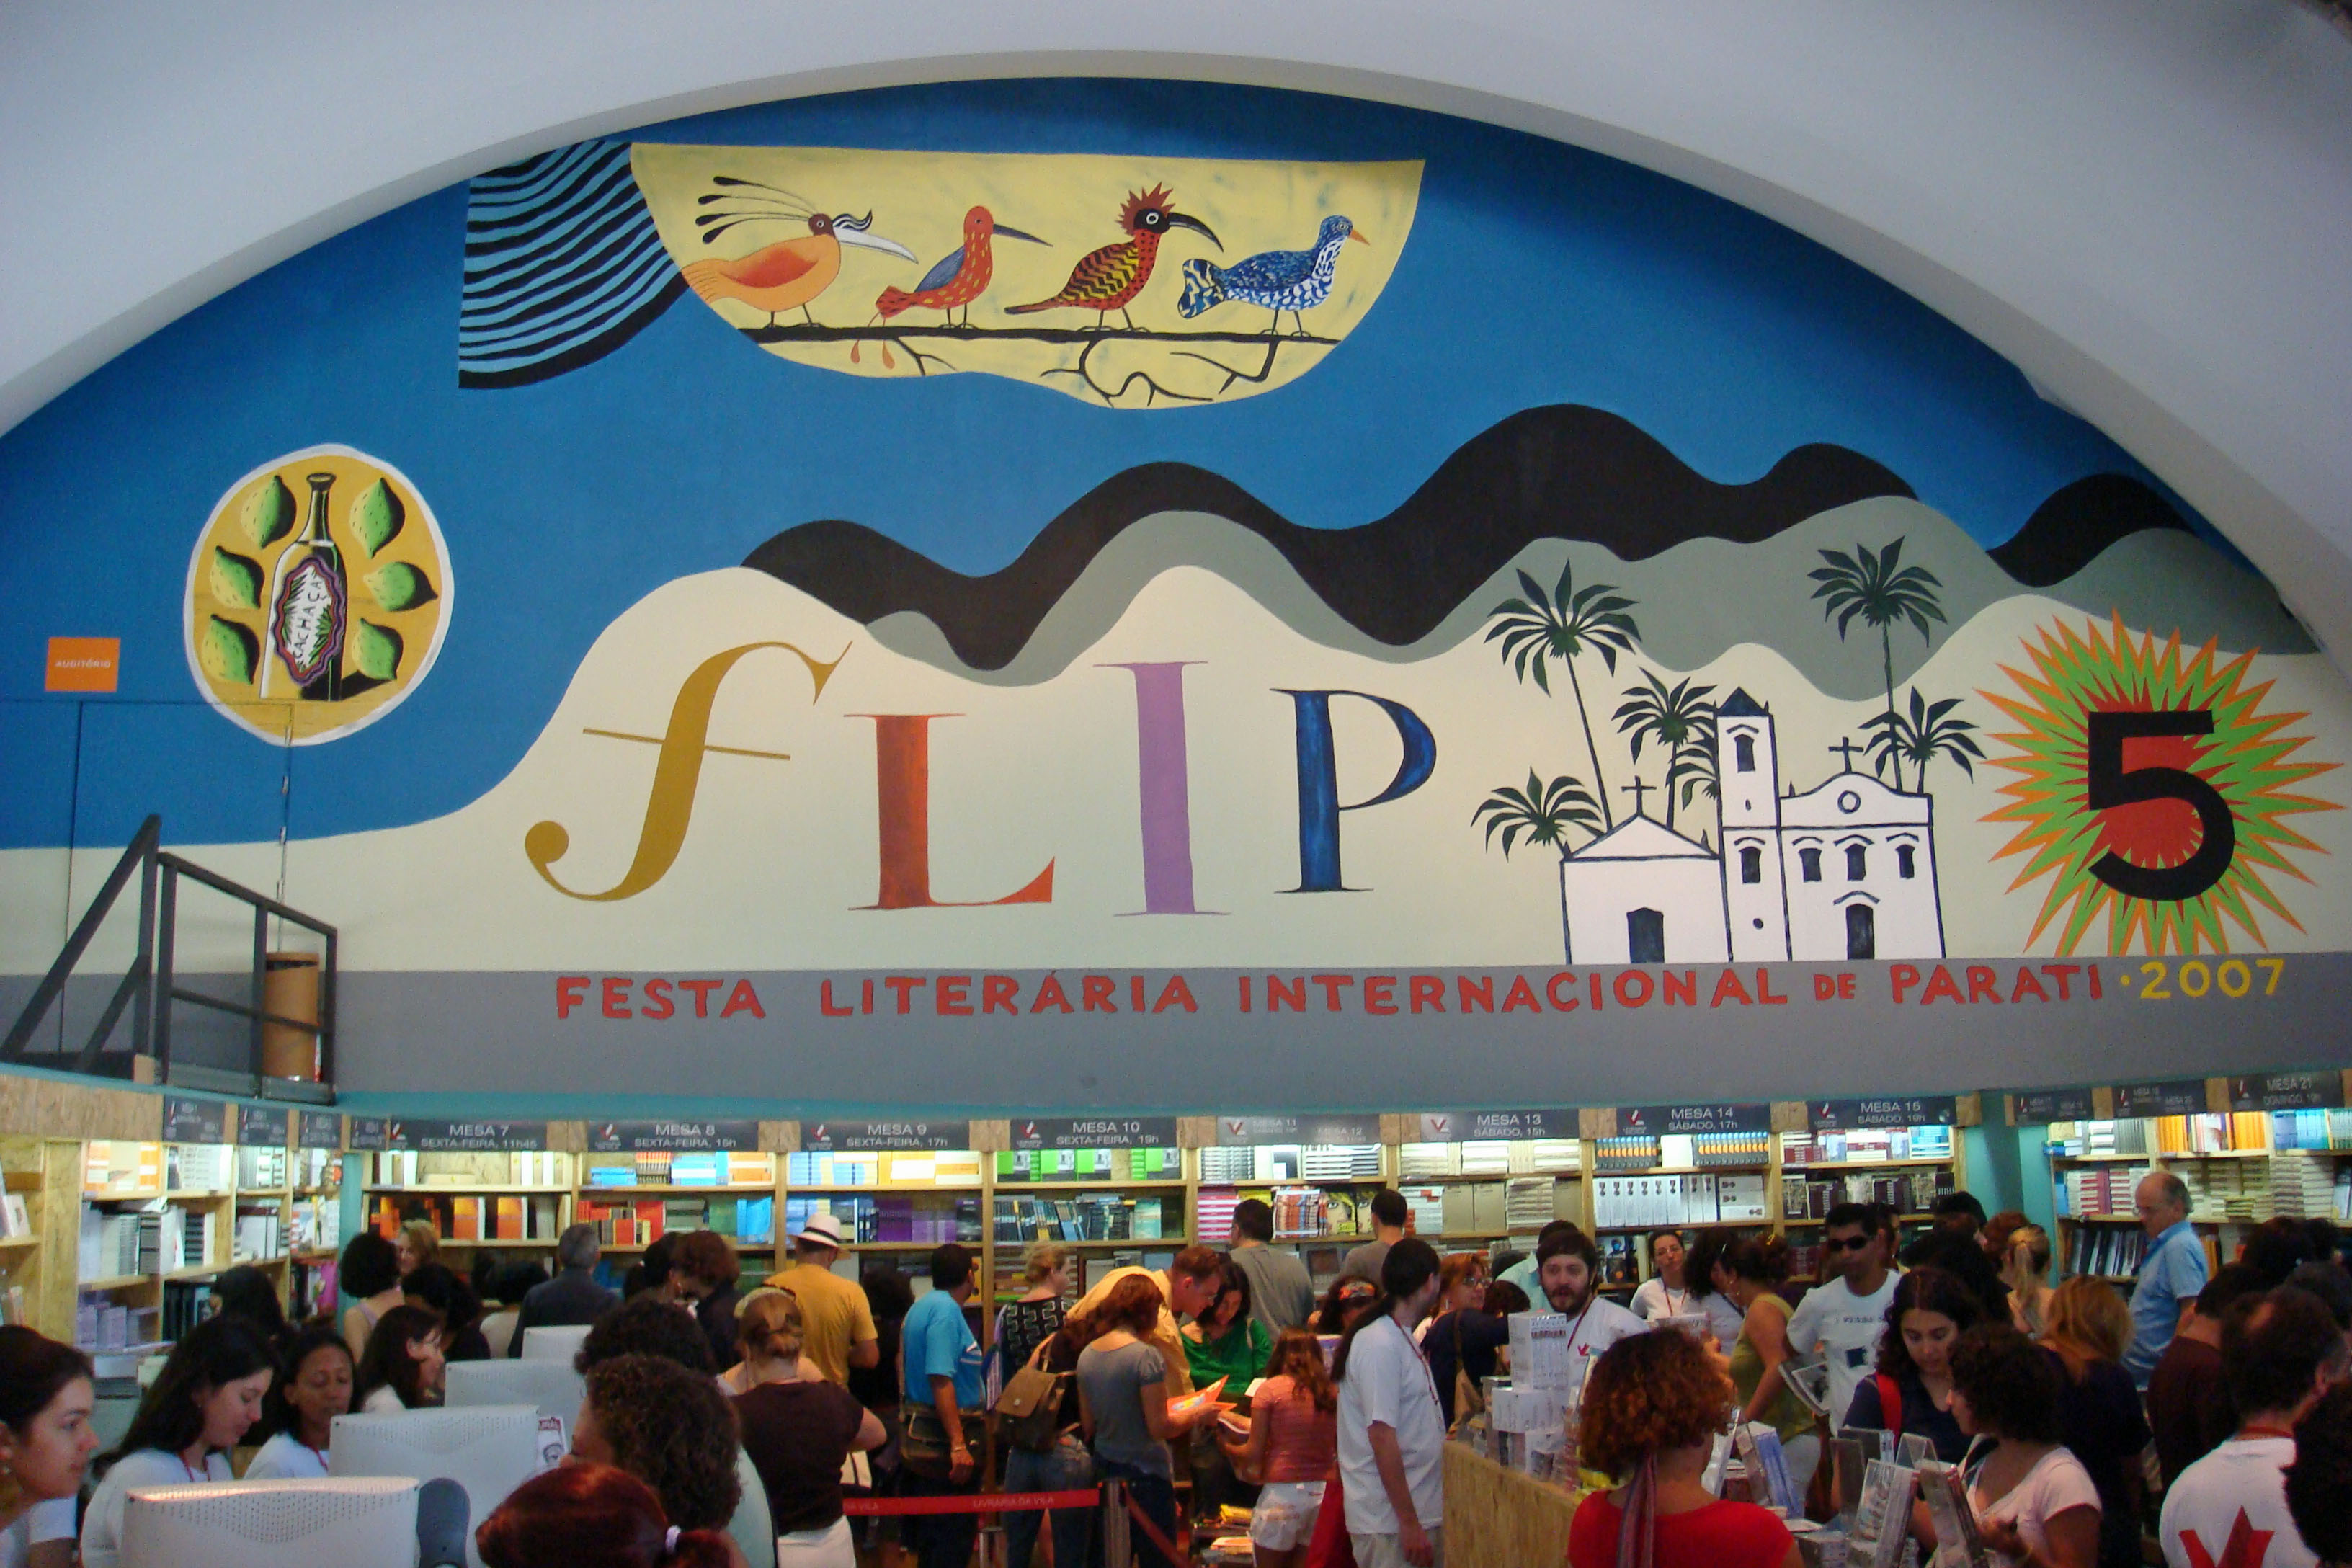 FLIP_2007.jpg